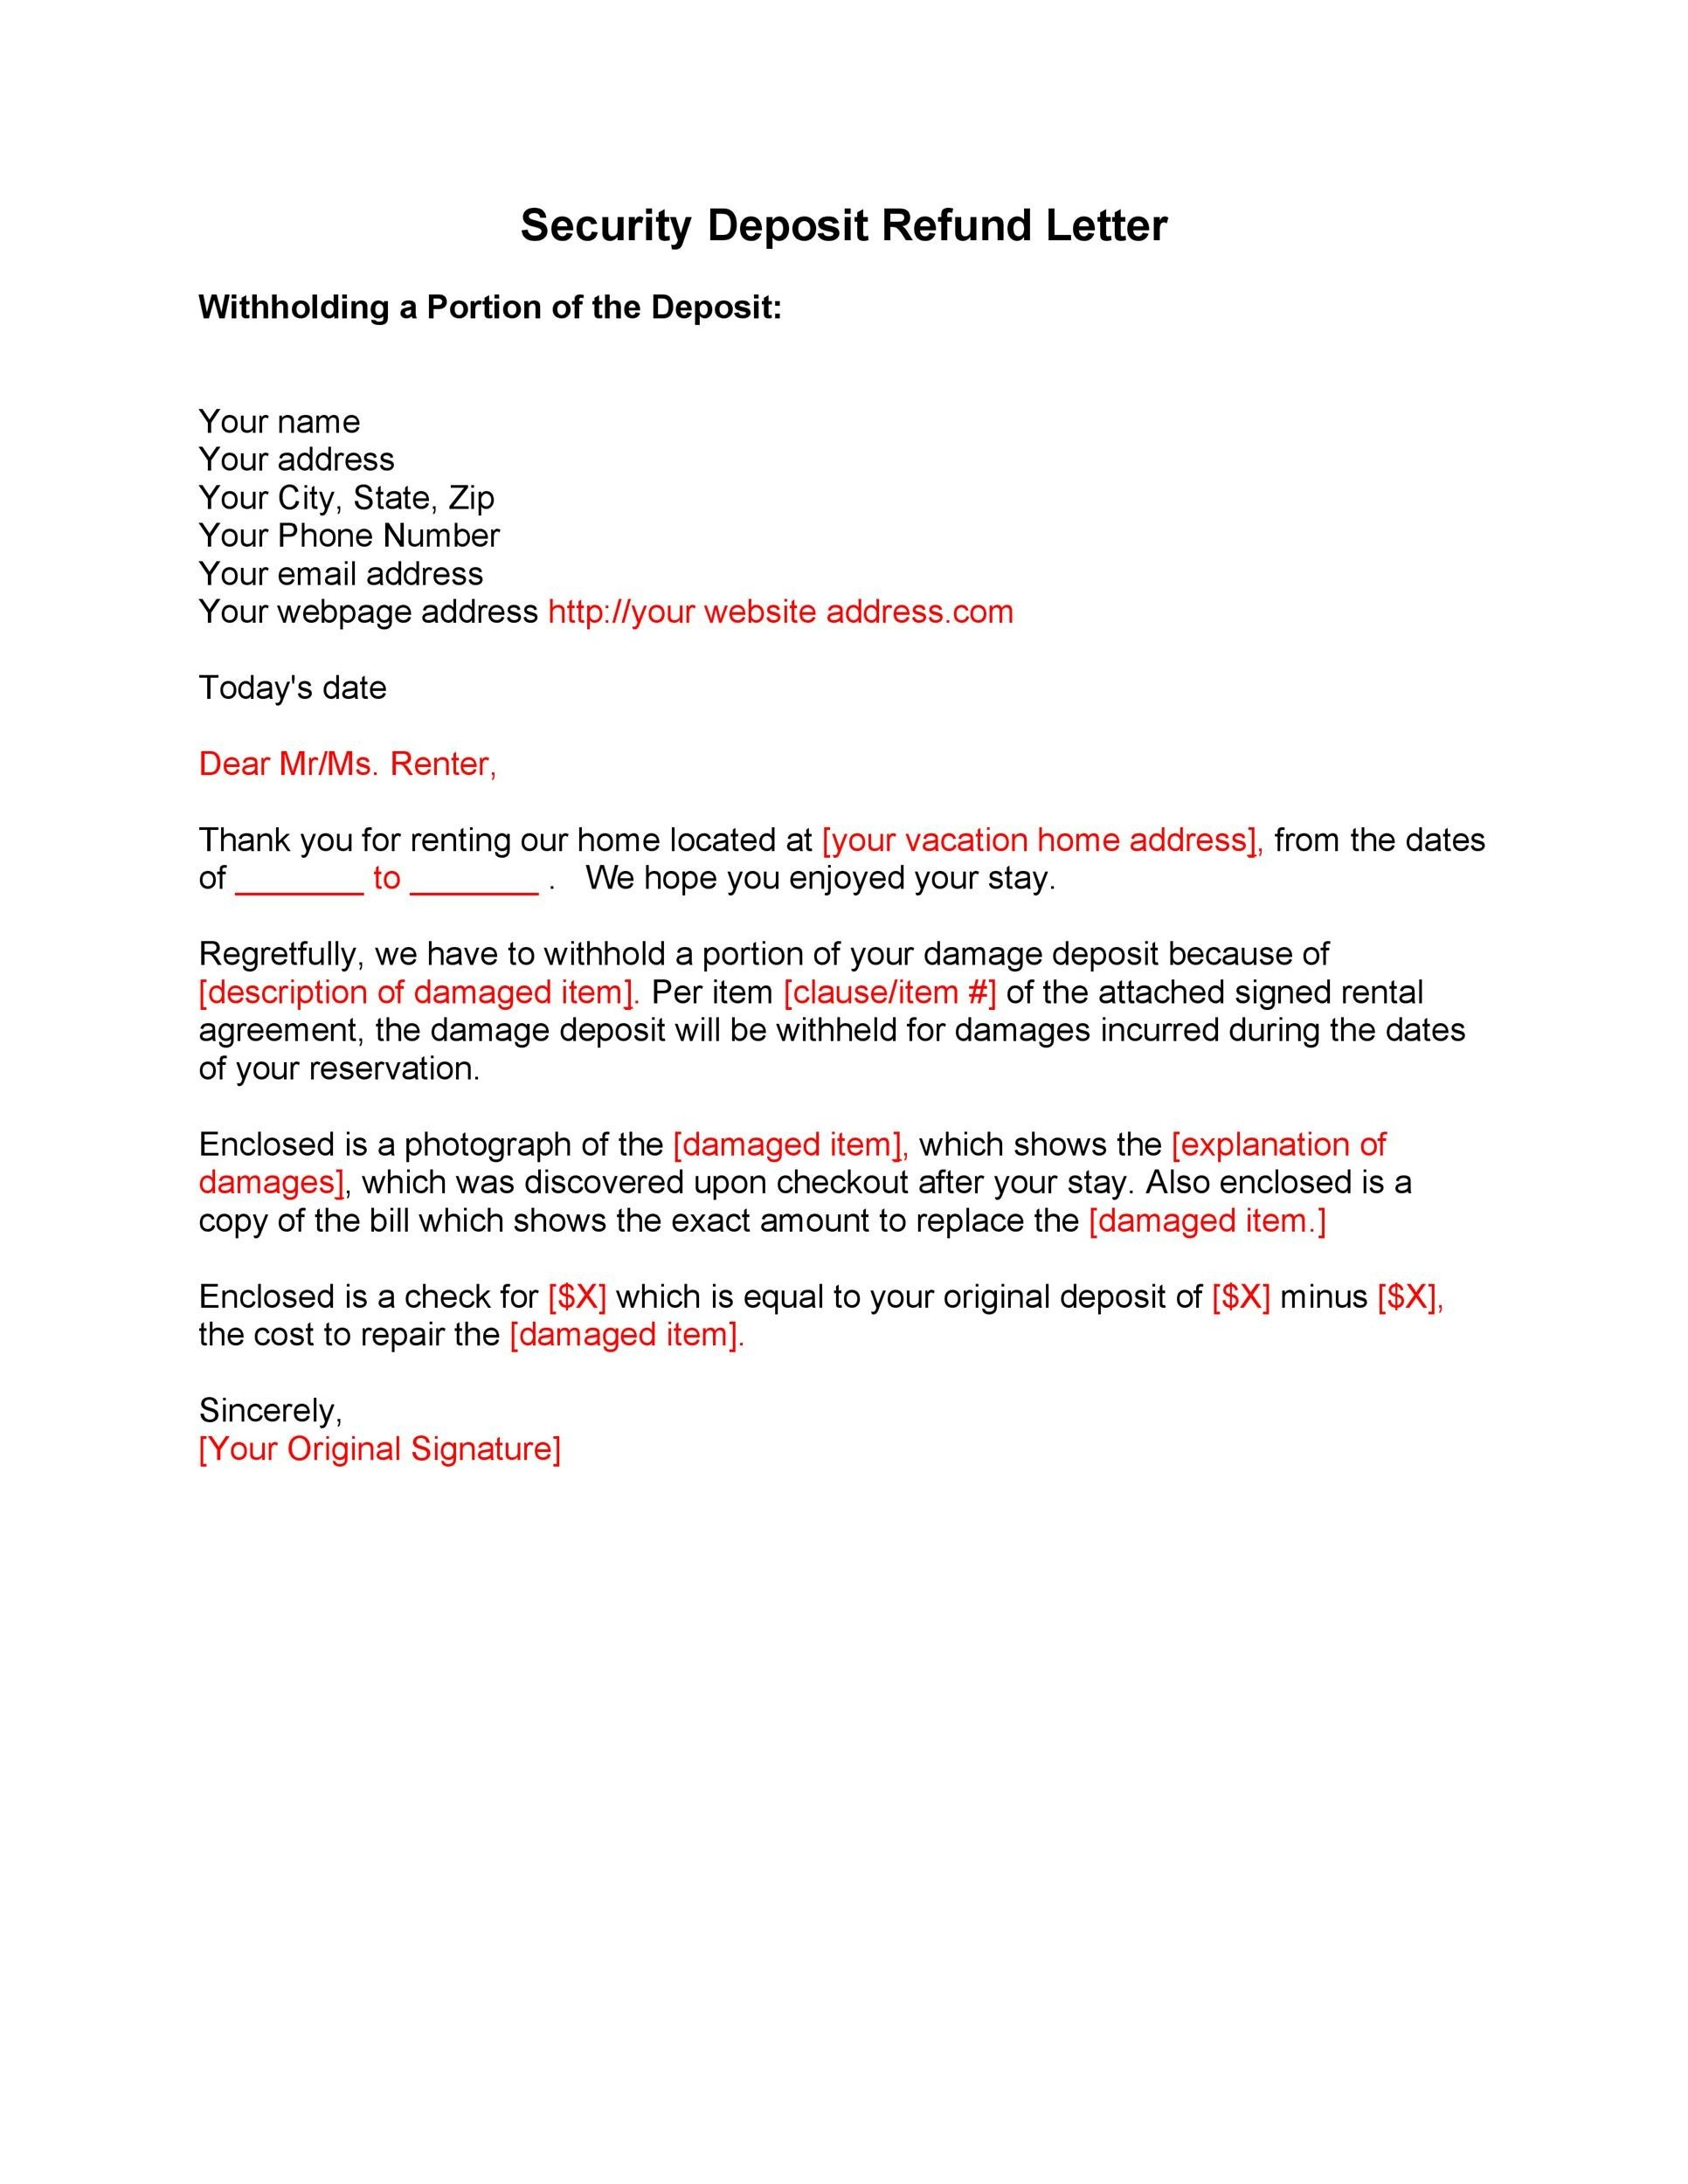 Free security deposit return letter 03